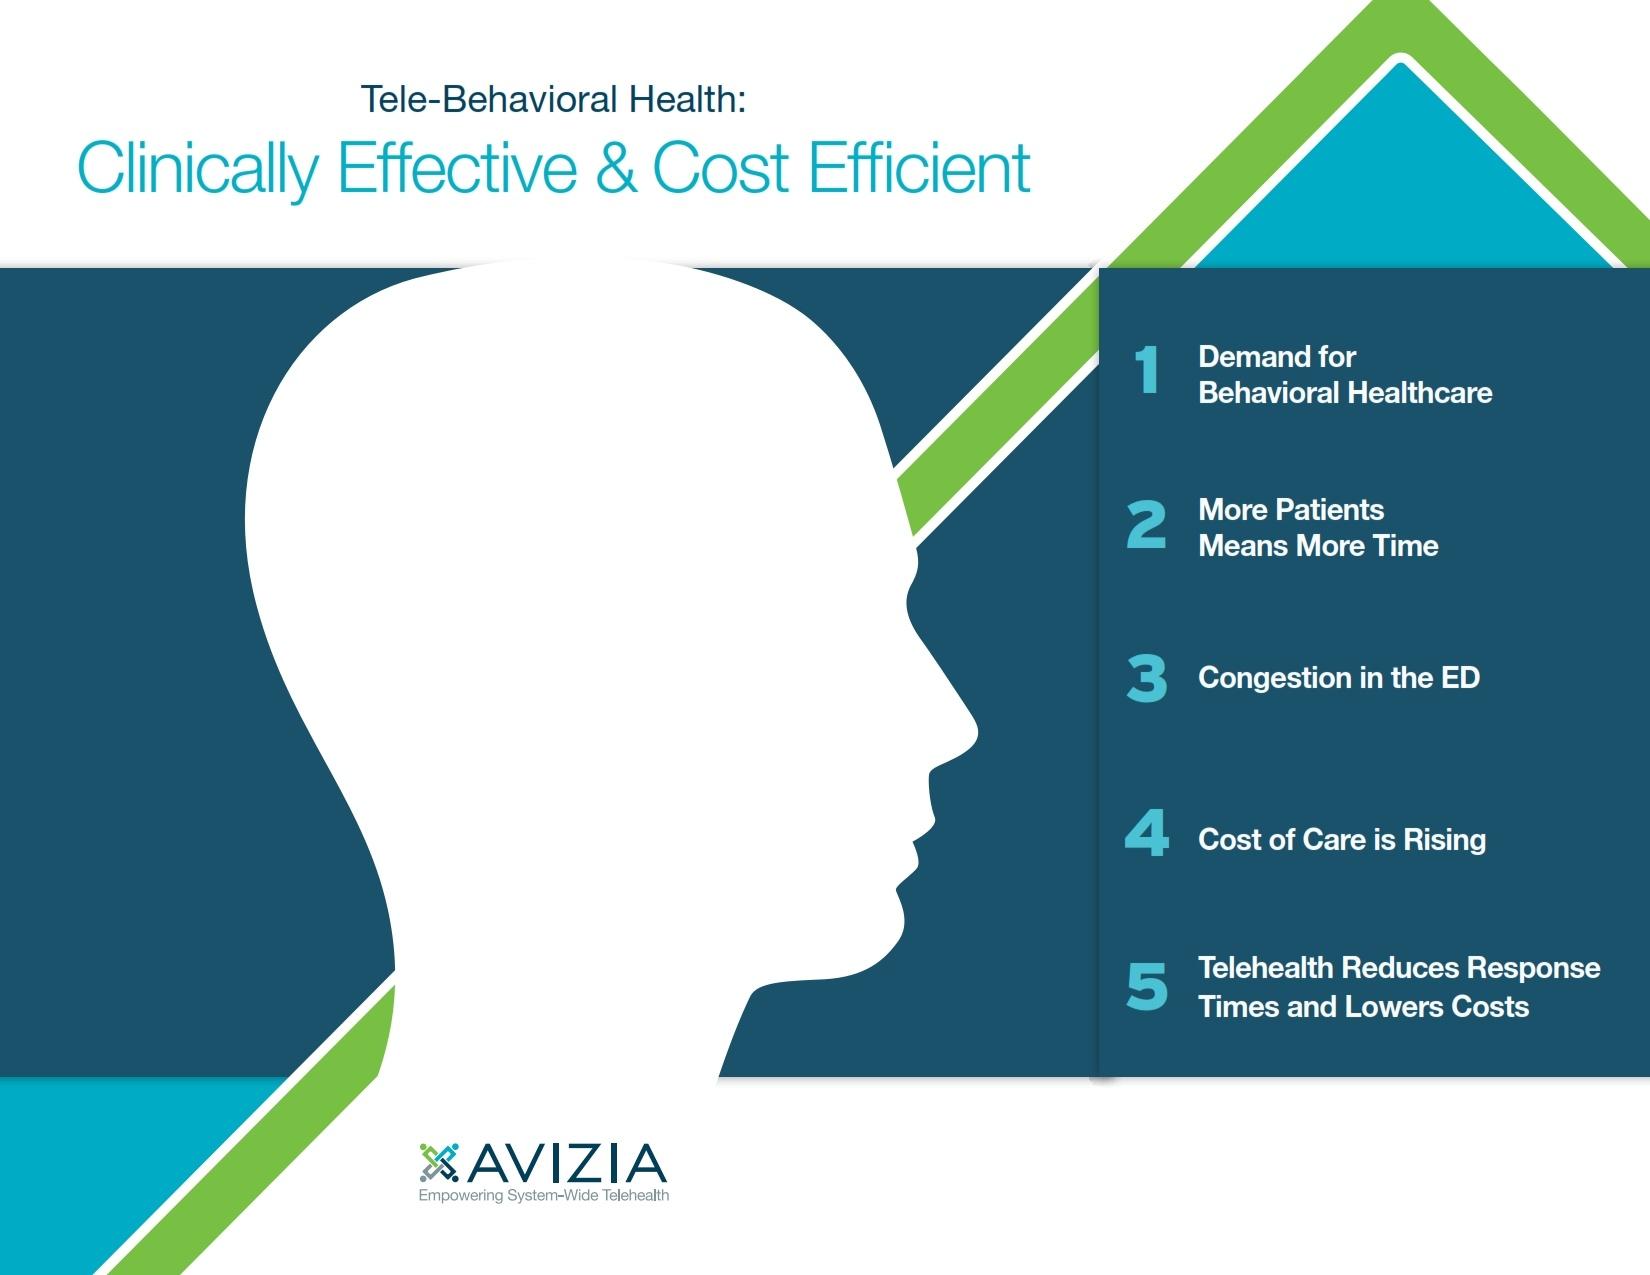 EB_Cover_Tele-Behavioral Health.jpg